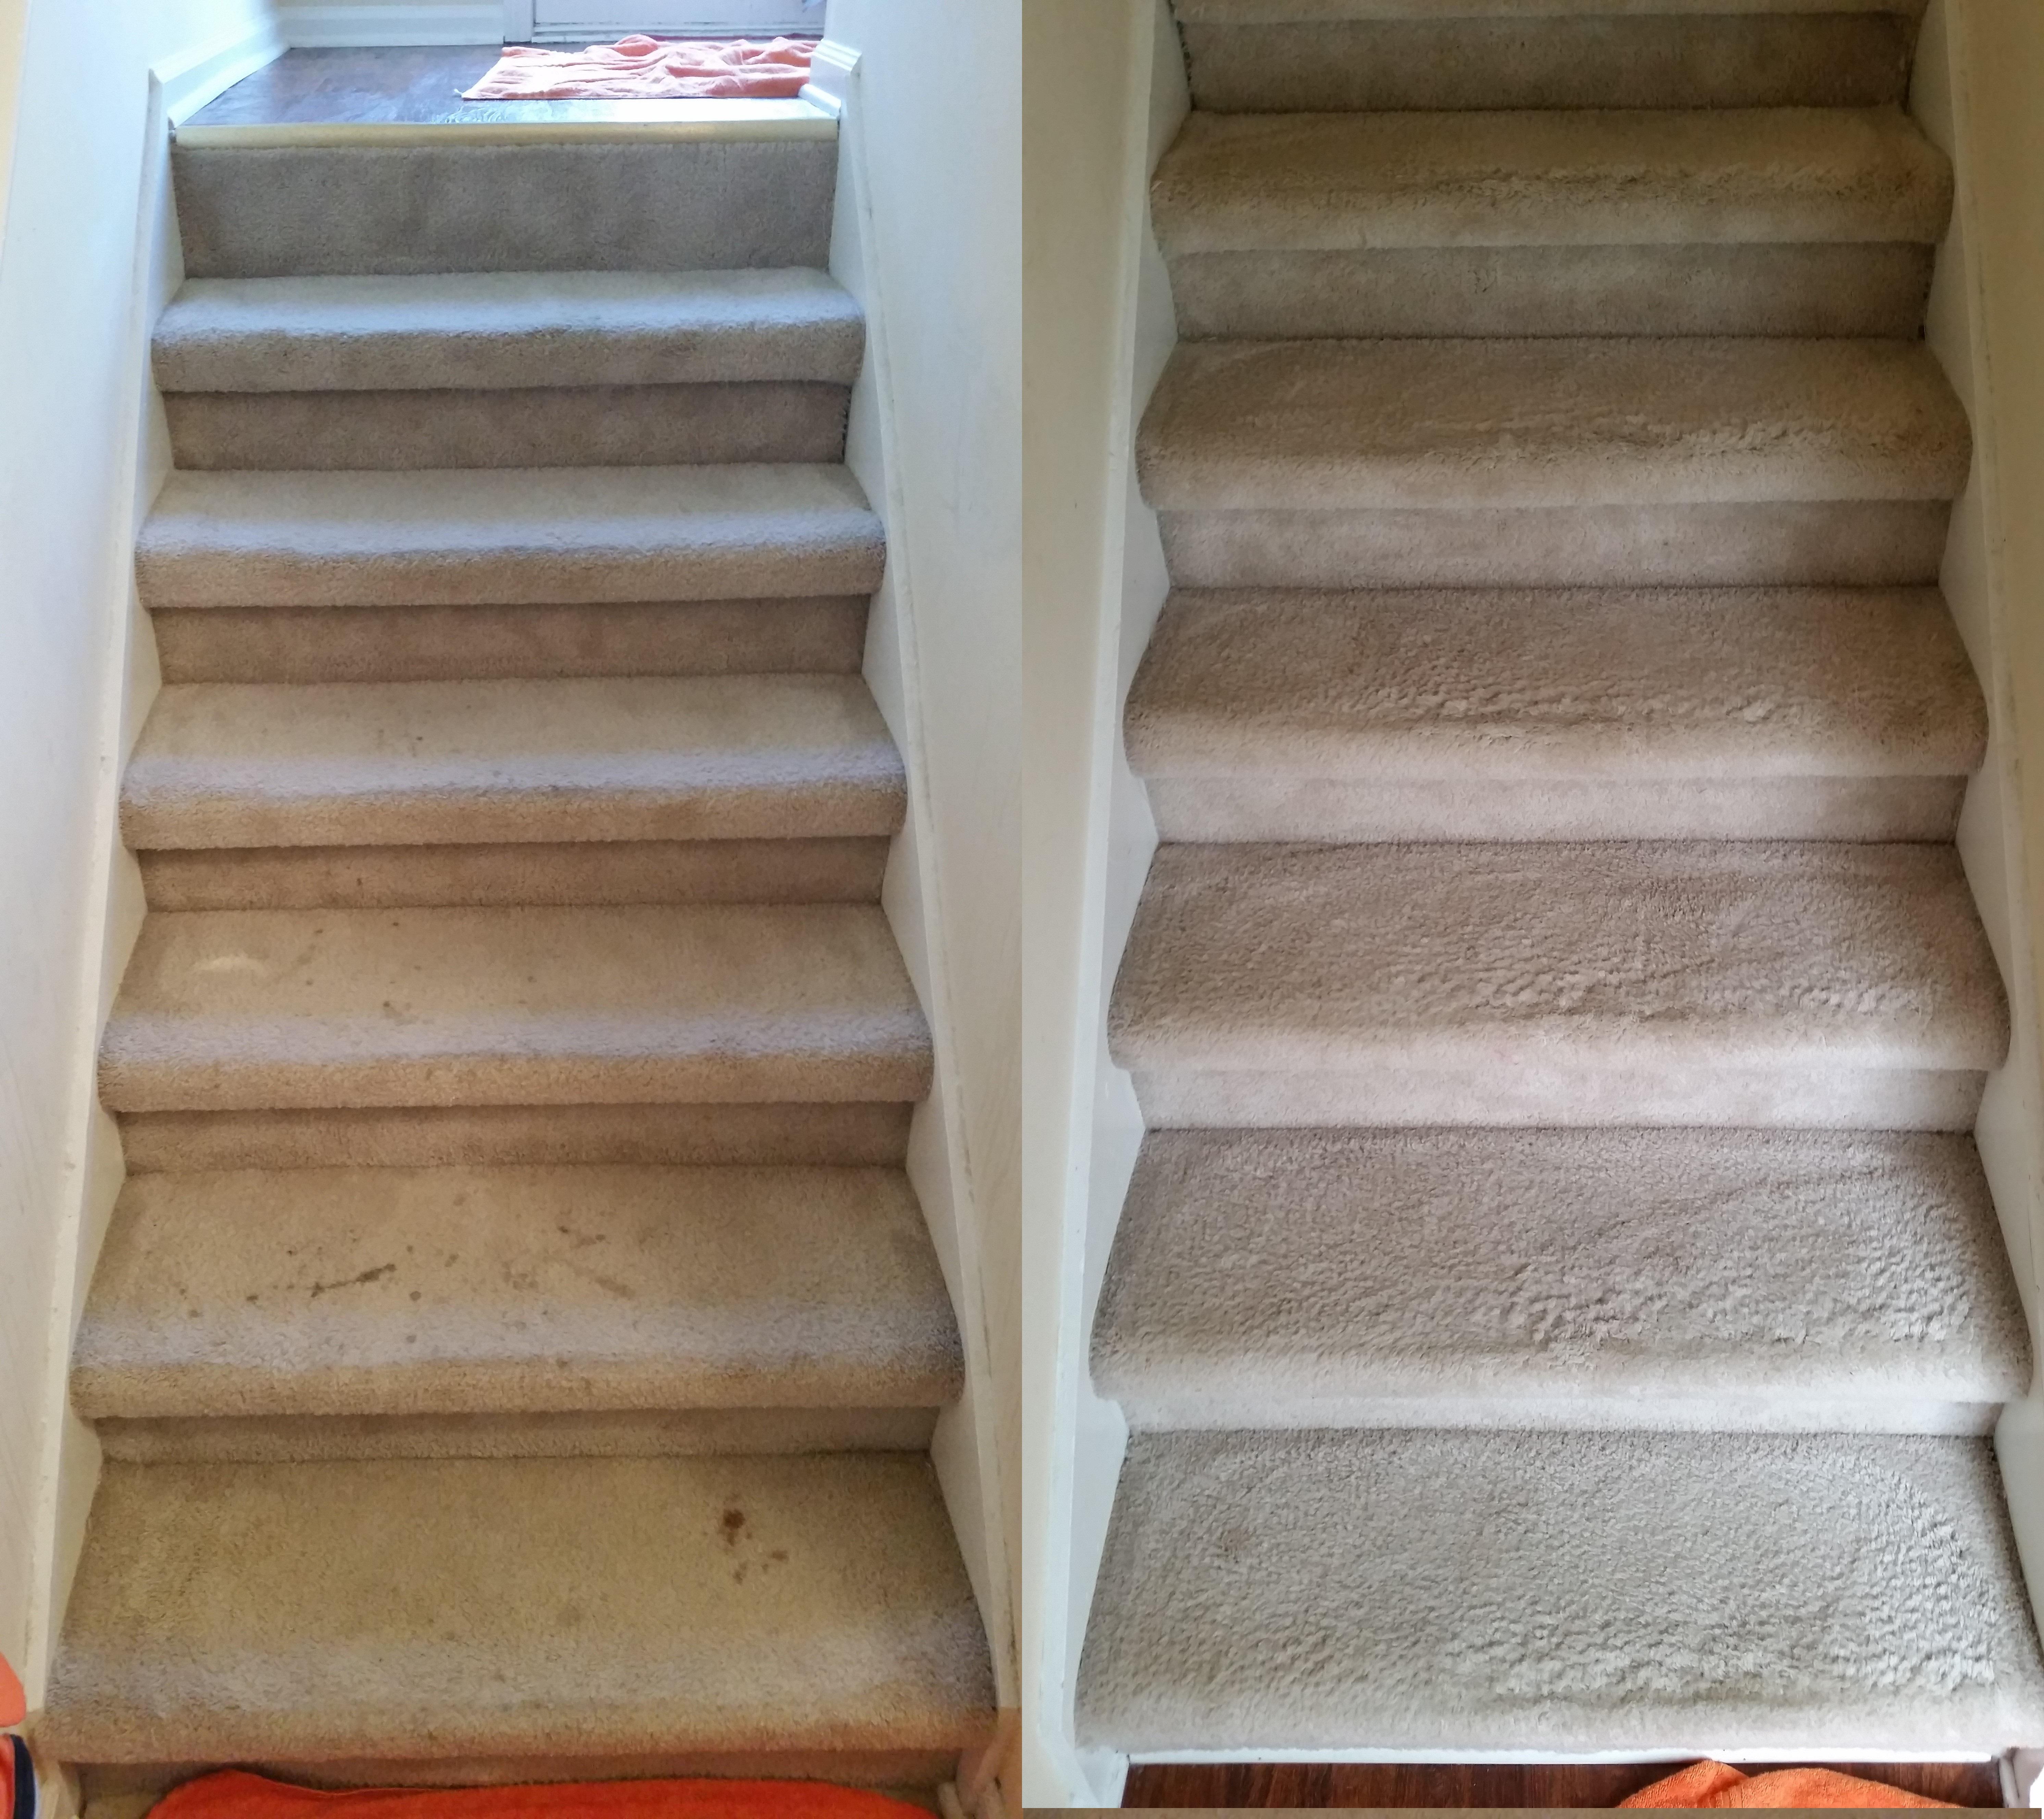 11-10-14-b-a-citrusolution-carpet-cleaning-suwanee-13